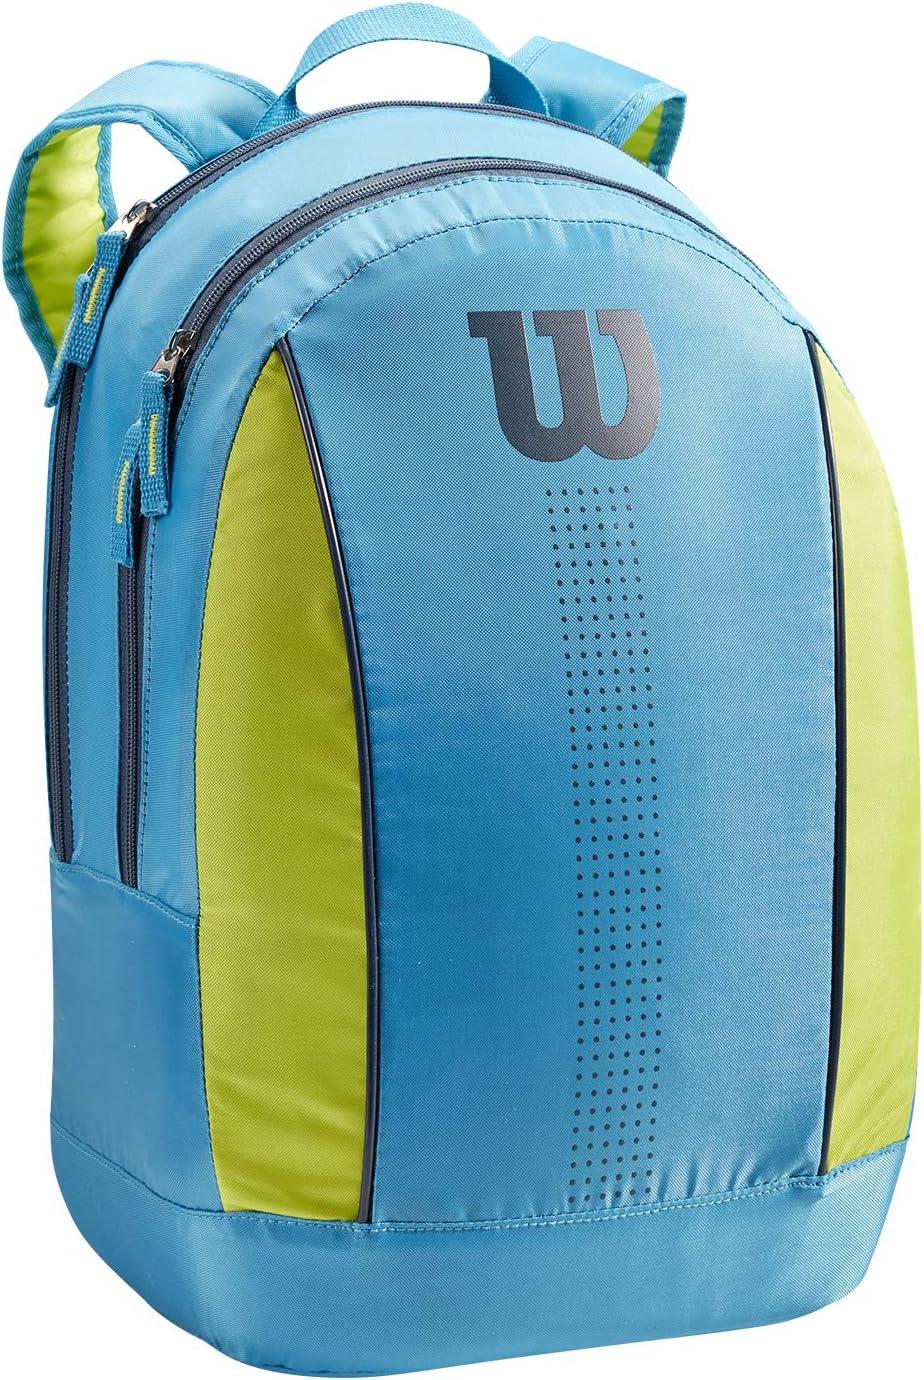 Azul//verde lima//azul marino WR8012903001 Wilson Junior Mochila de tenis Hasta 2 raquetas